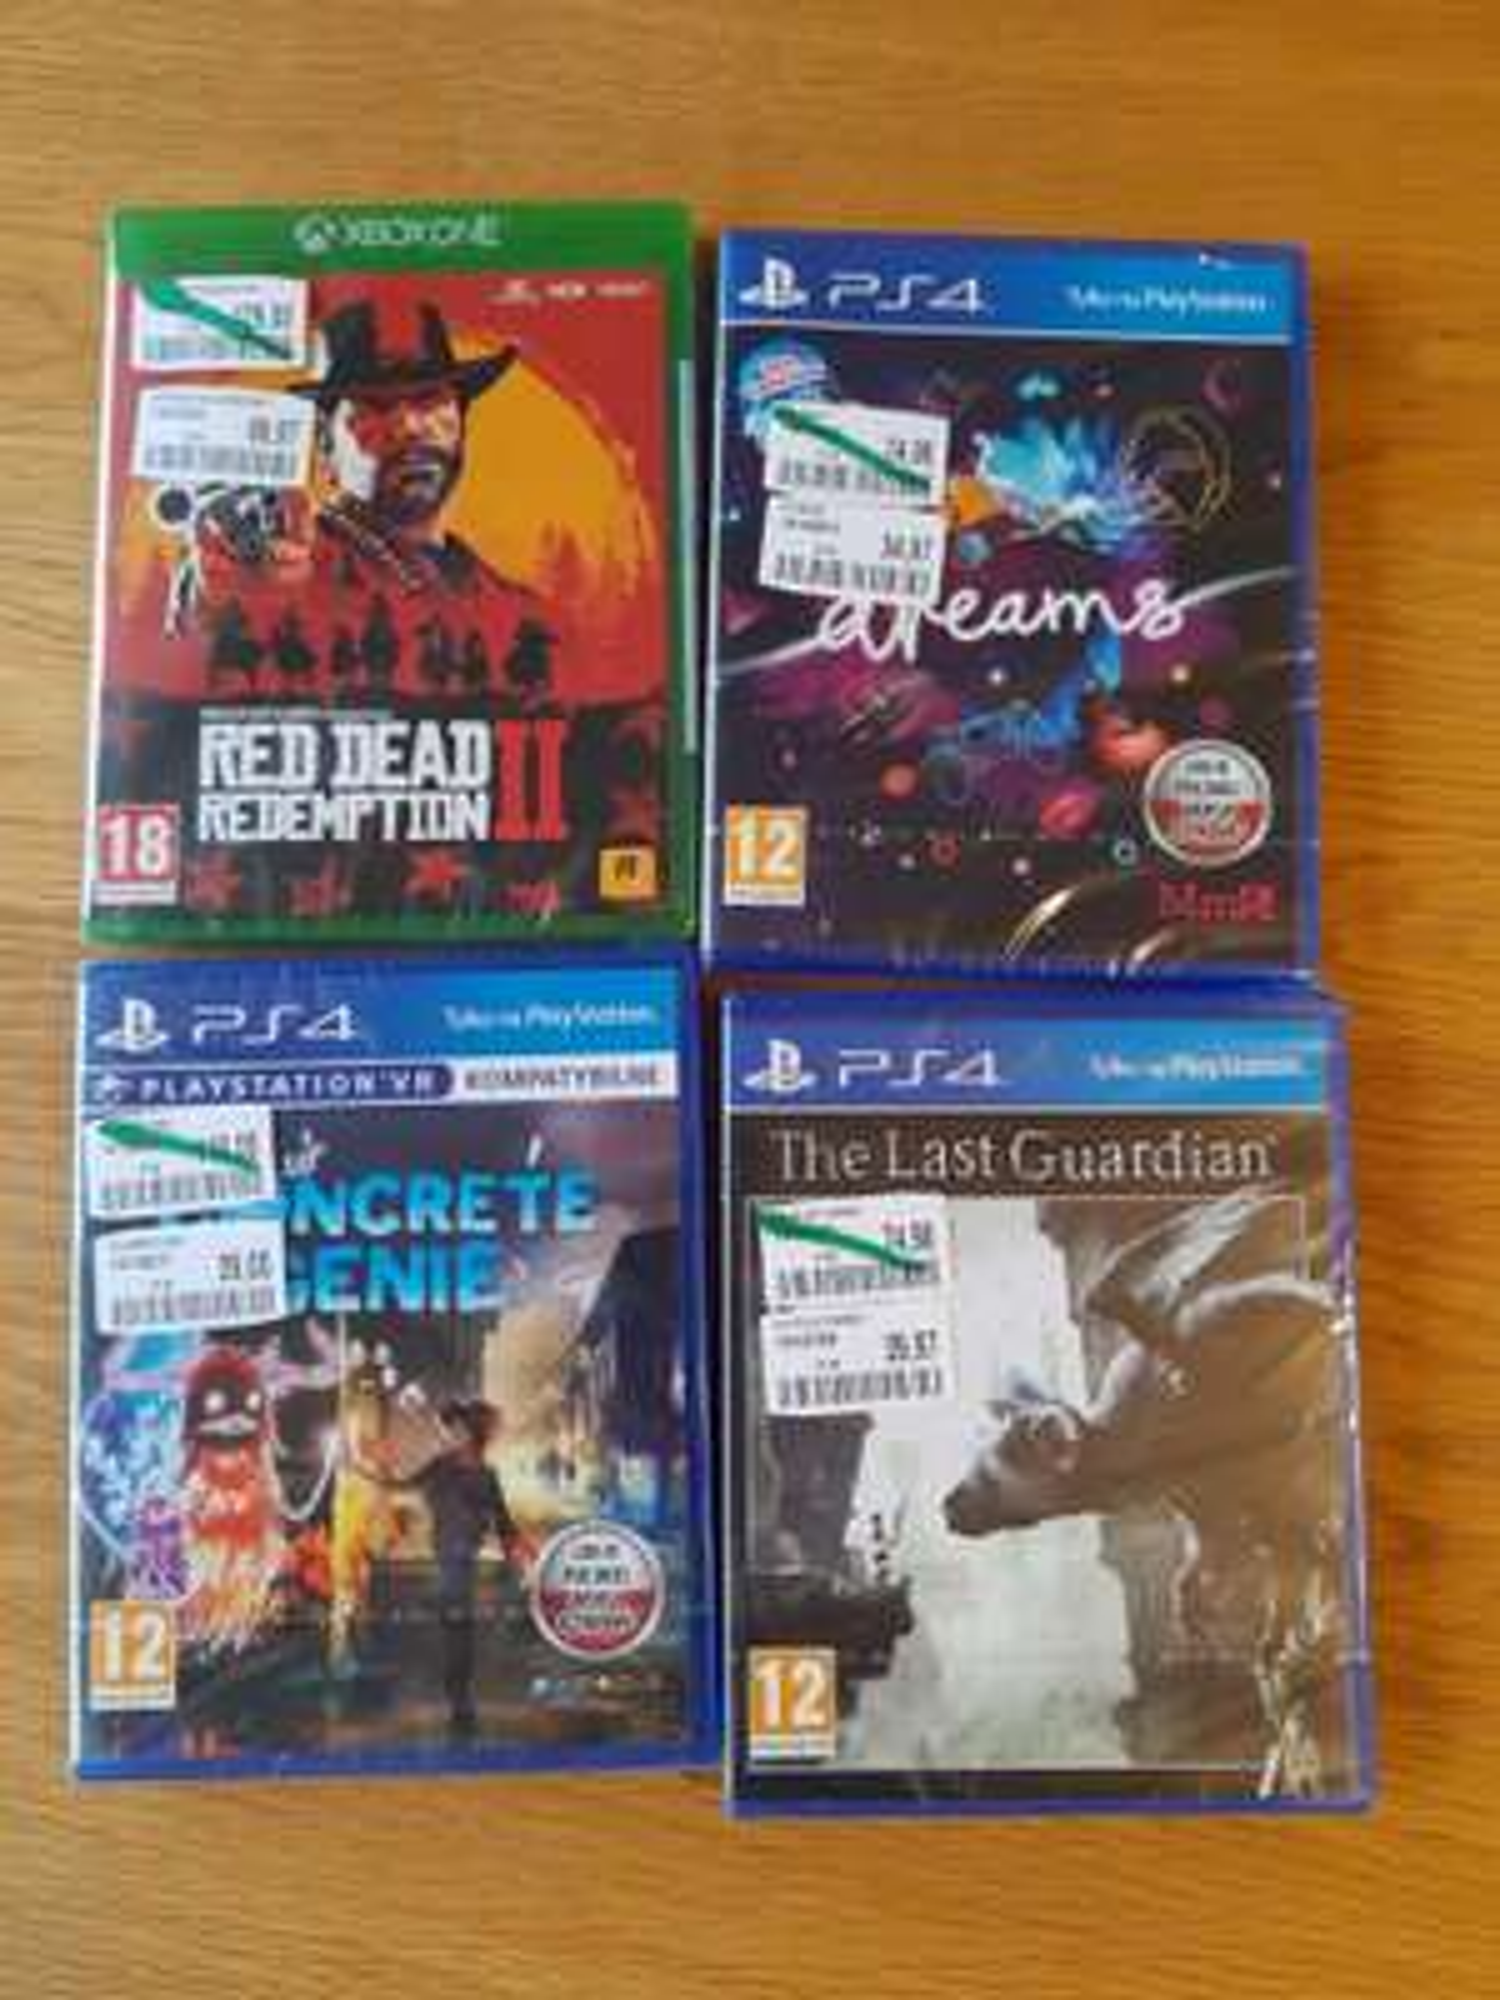 Gry Xbox PlayStation MediaMarkt Red Dead Redemption 2, Dreams, Death Stranding